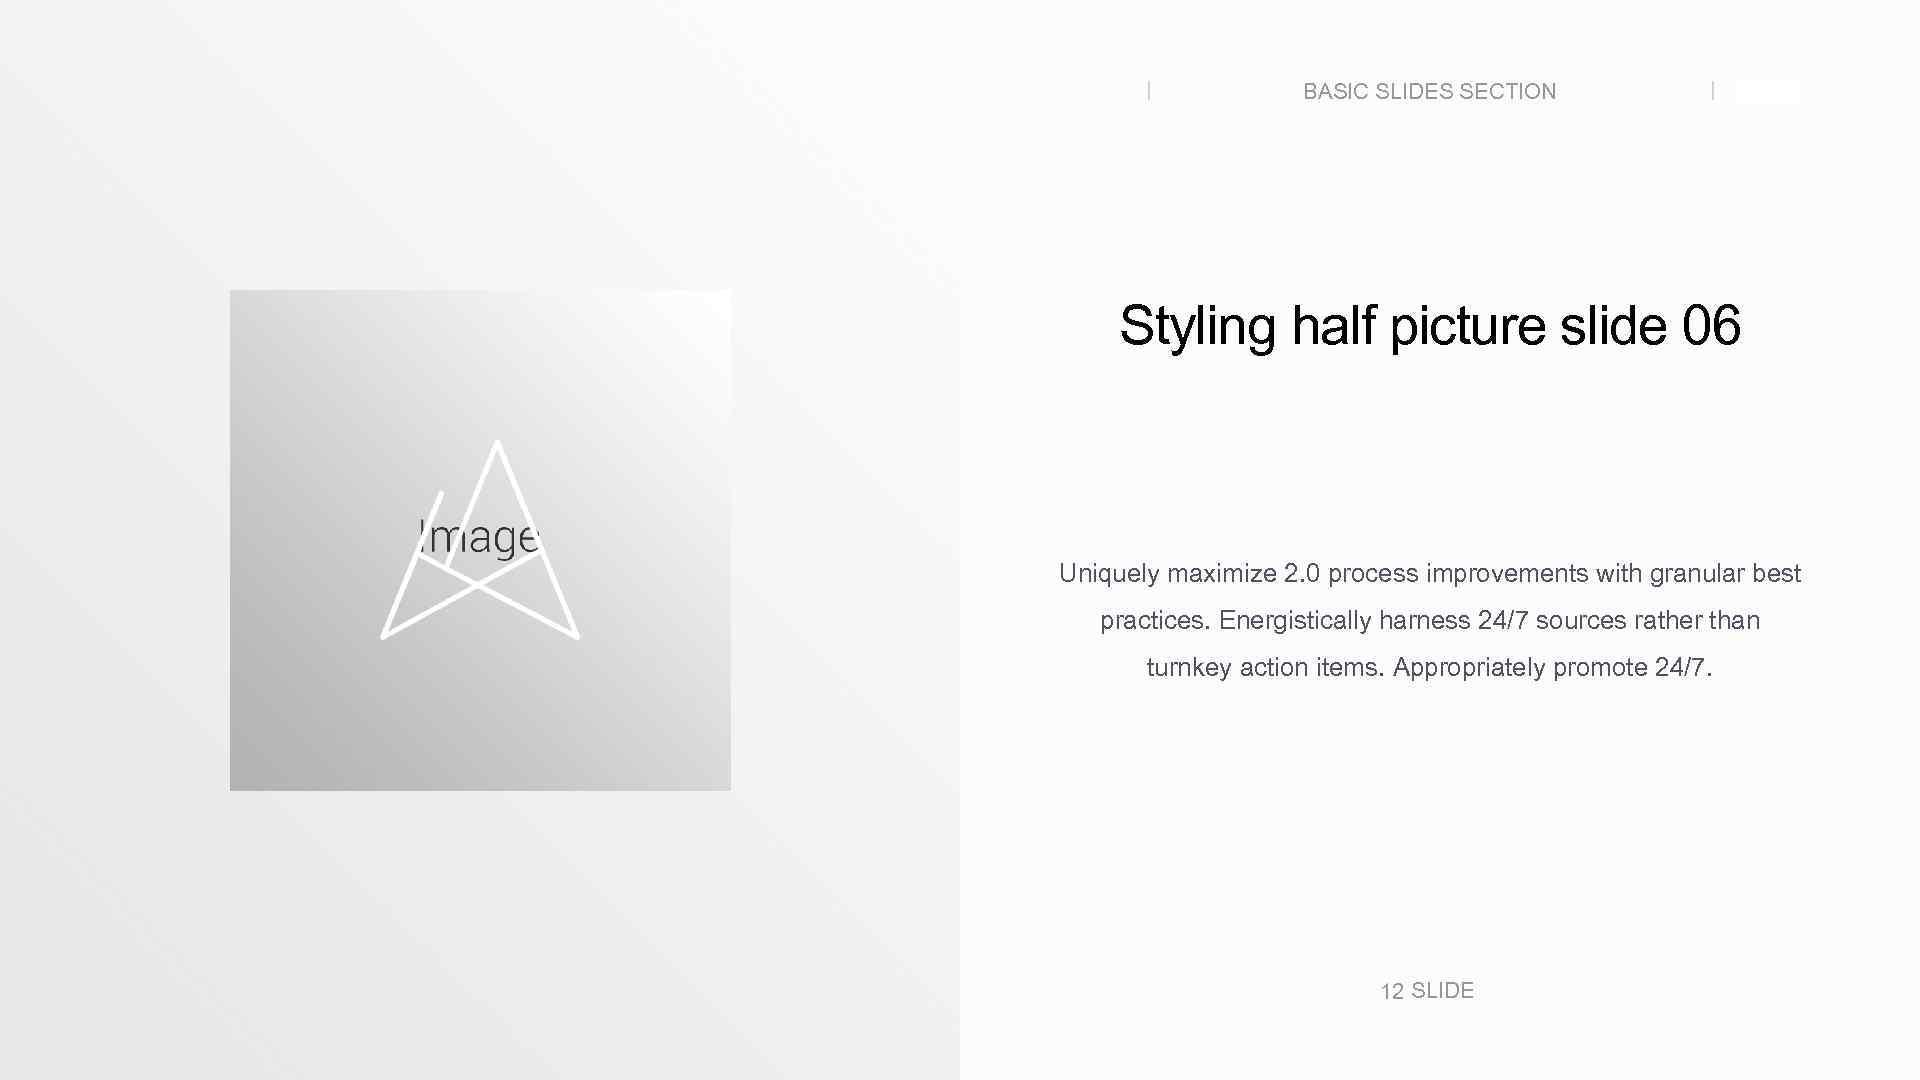 BASIC SLIDES SECTION SLIDE Styling half picture slide 06 Uniquely maximize 2. 0 process